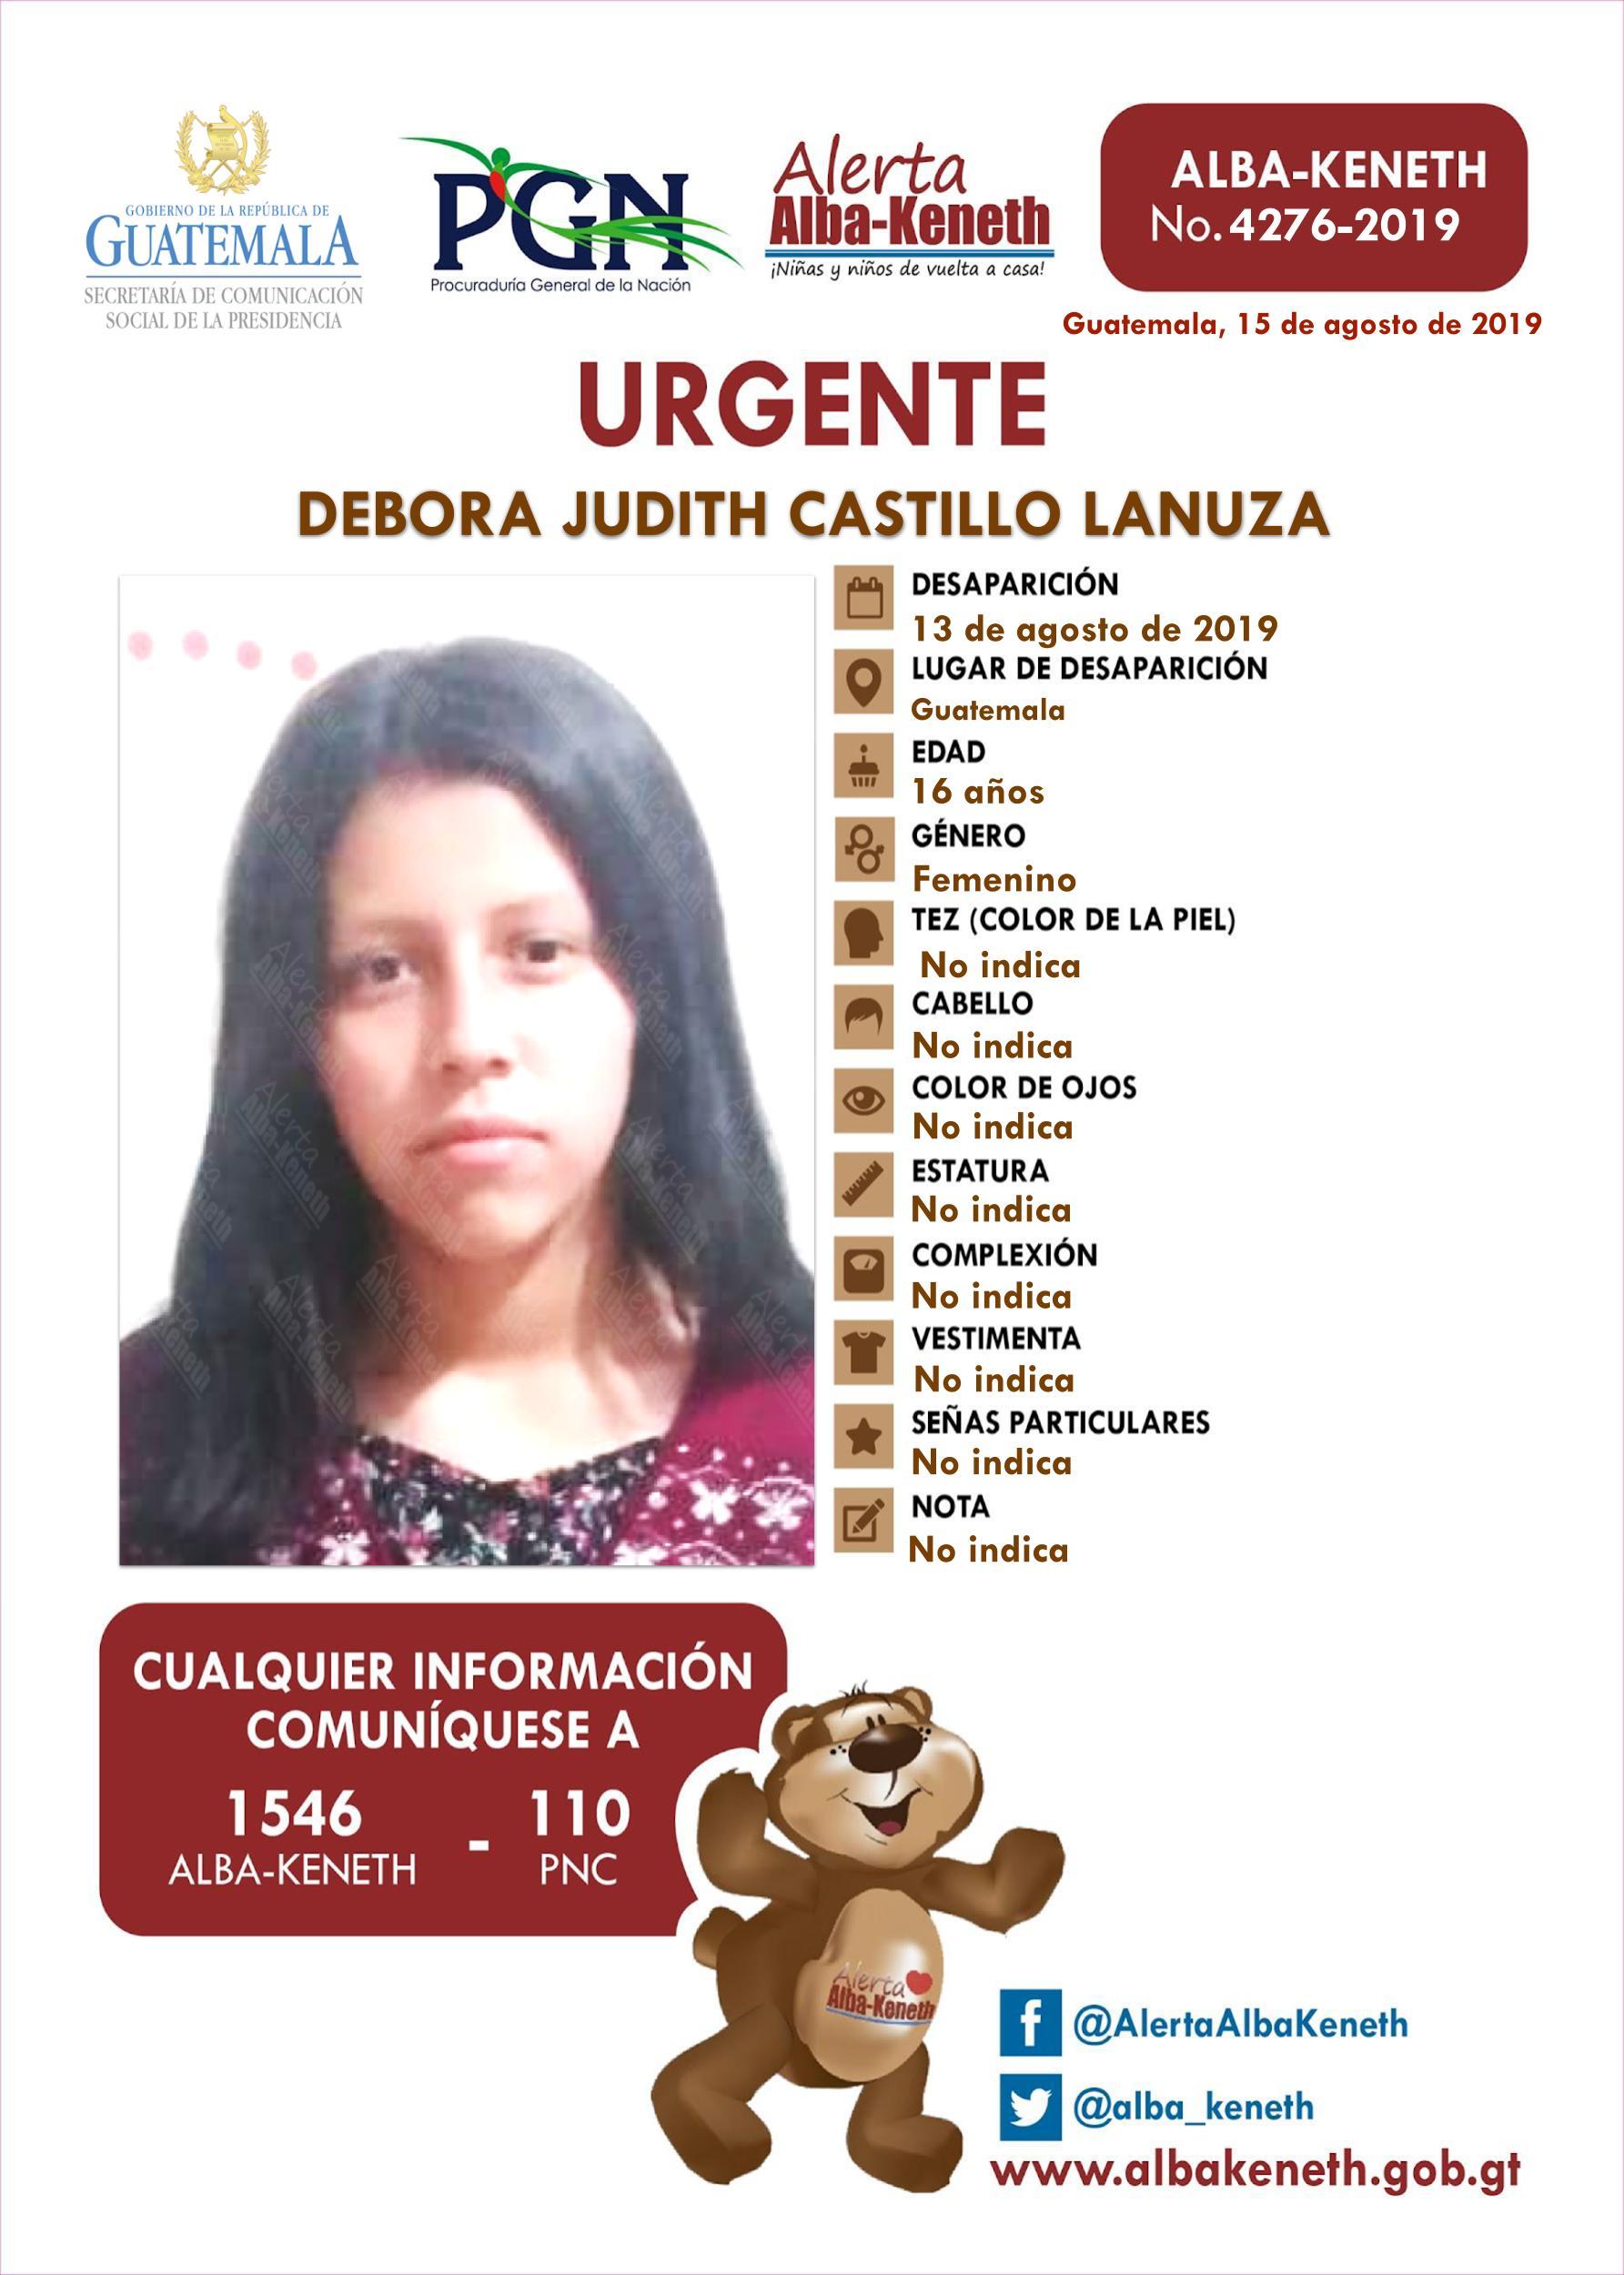 Debora Judith Castillo Lanuza